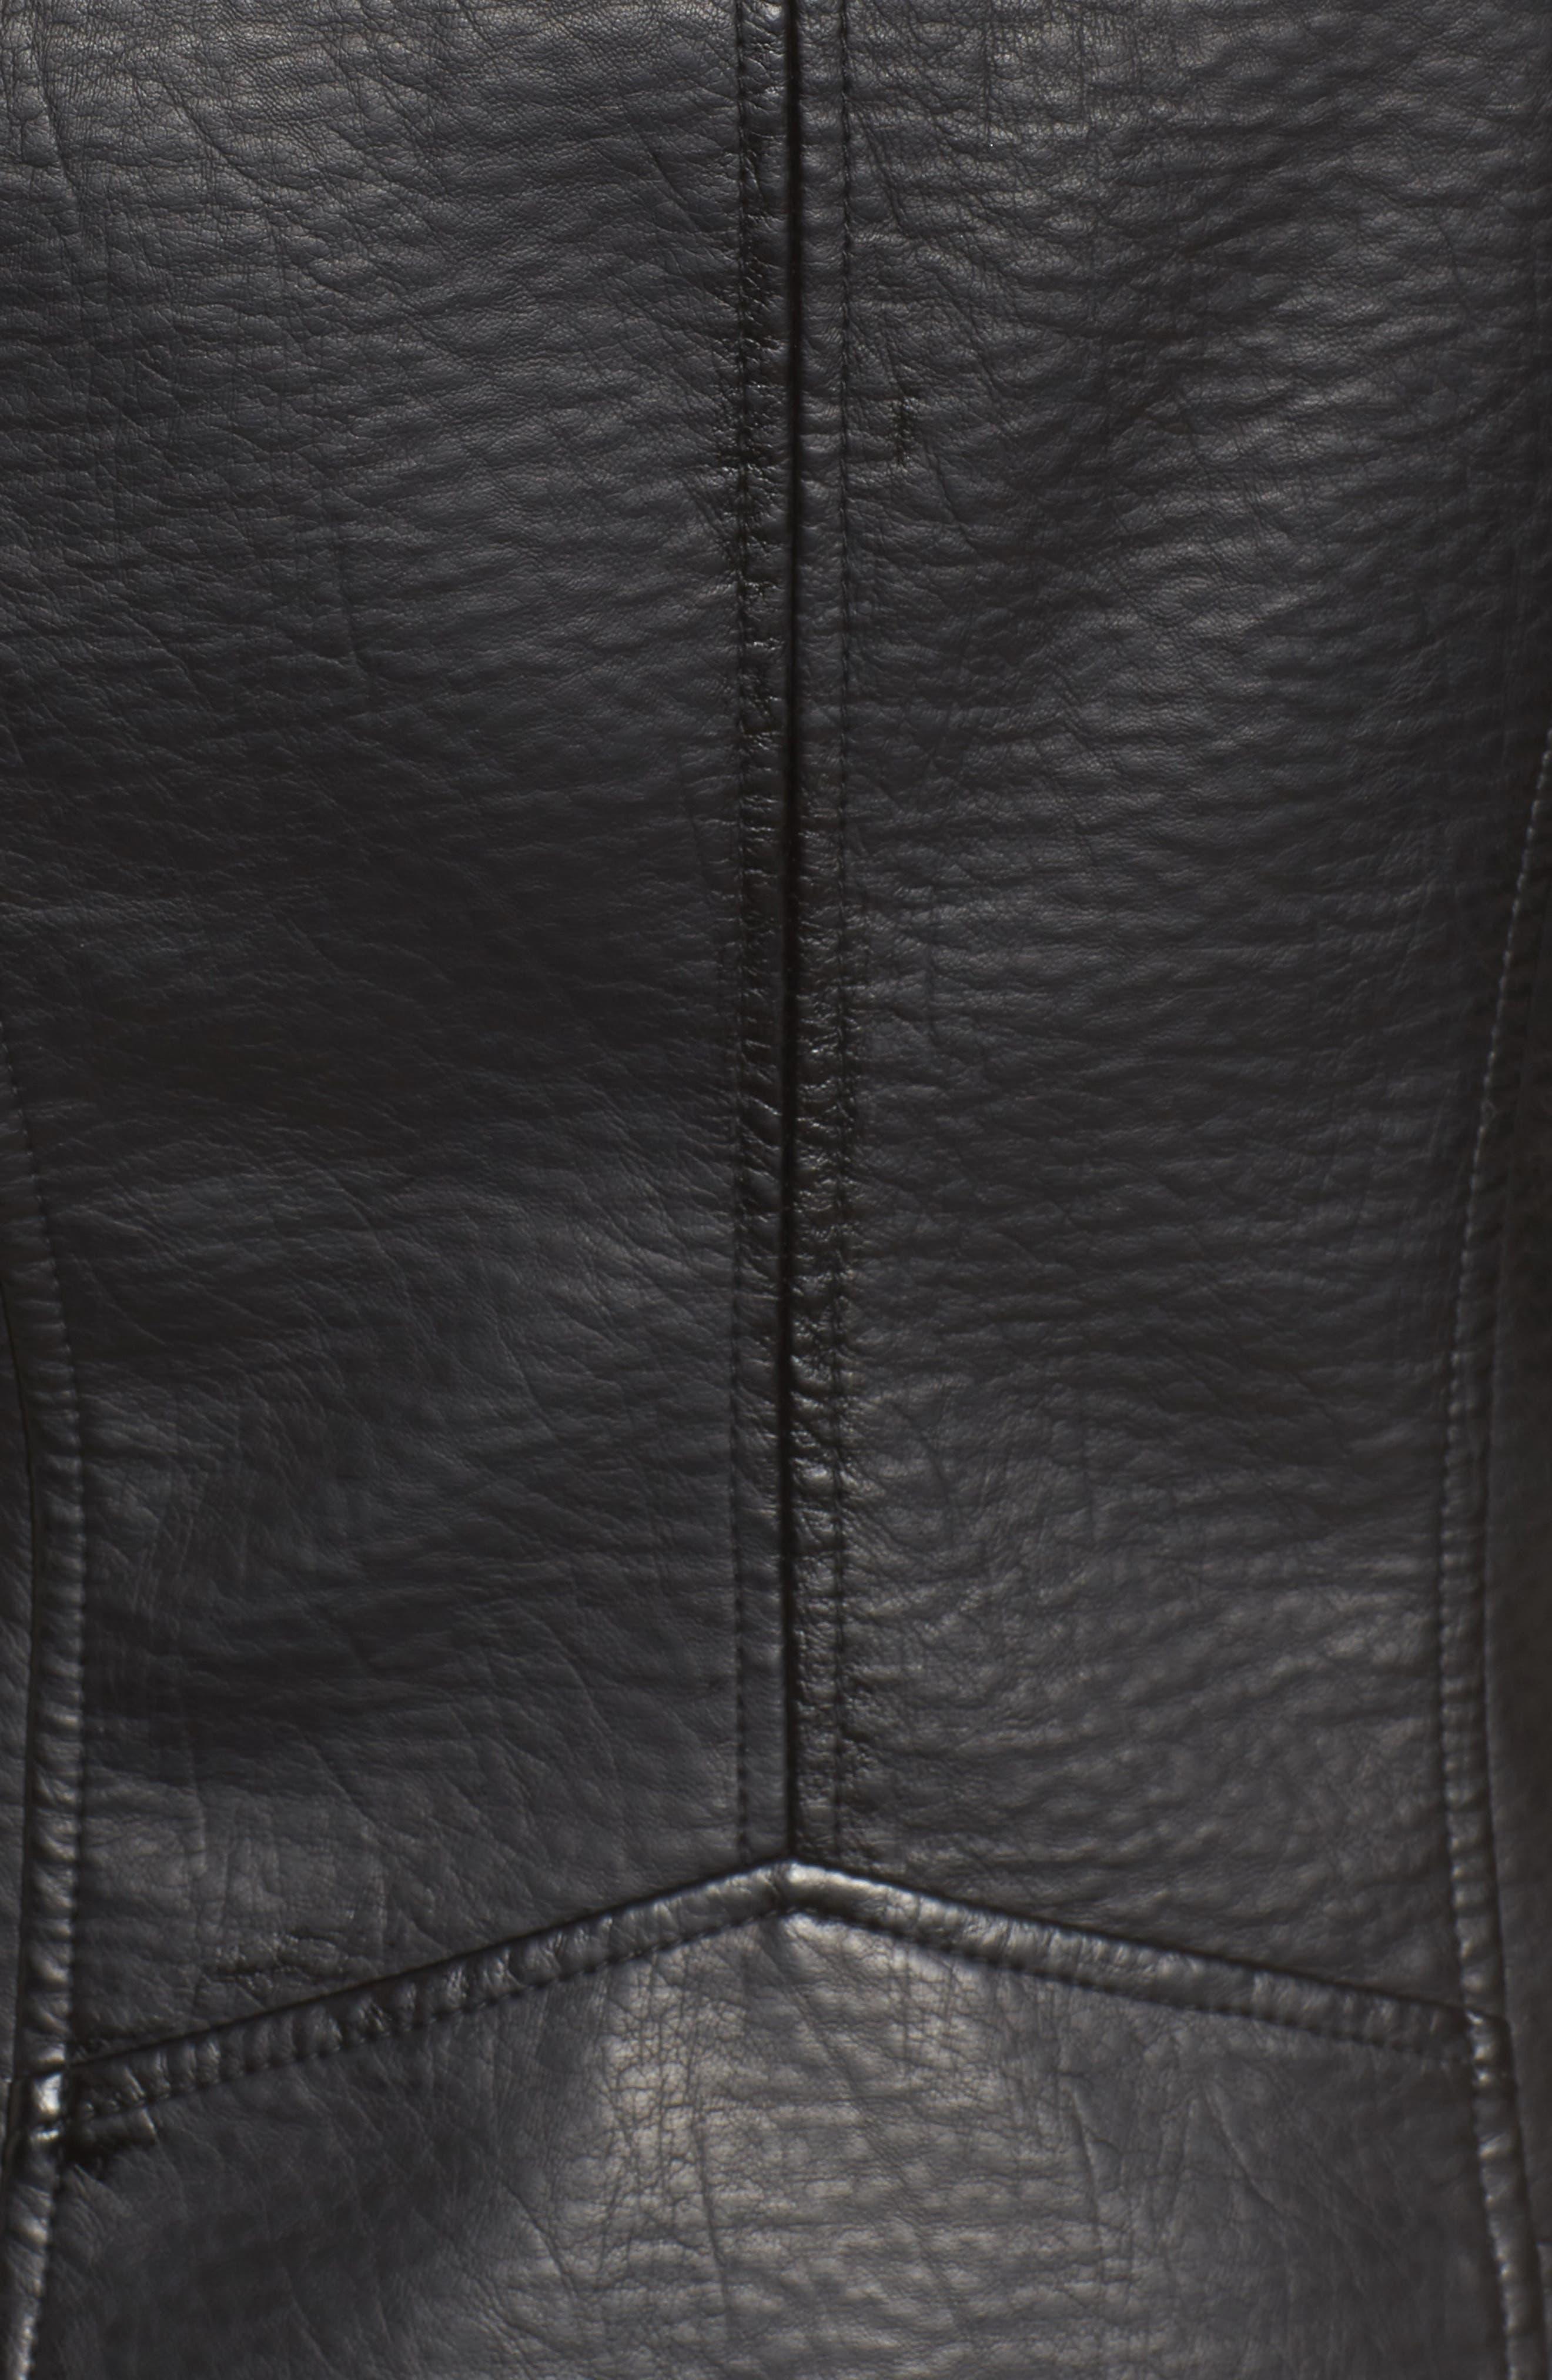 Textured Faux Leather Jacket with Removable Faux Fur Trim,                             Alternate thumbnail 5, color,                             Black